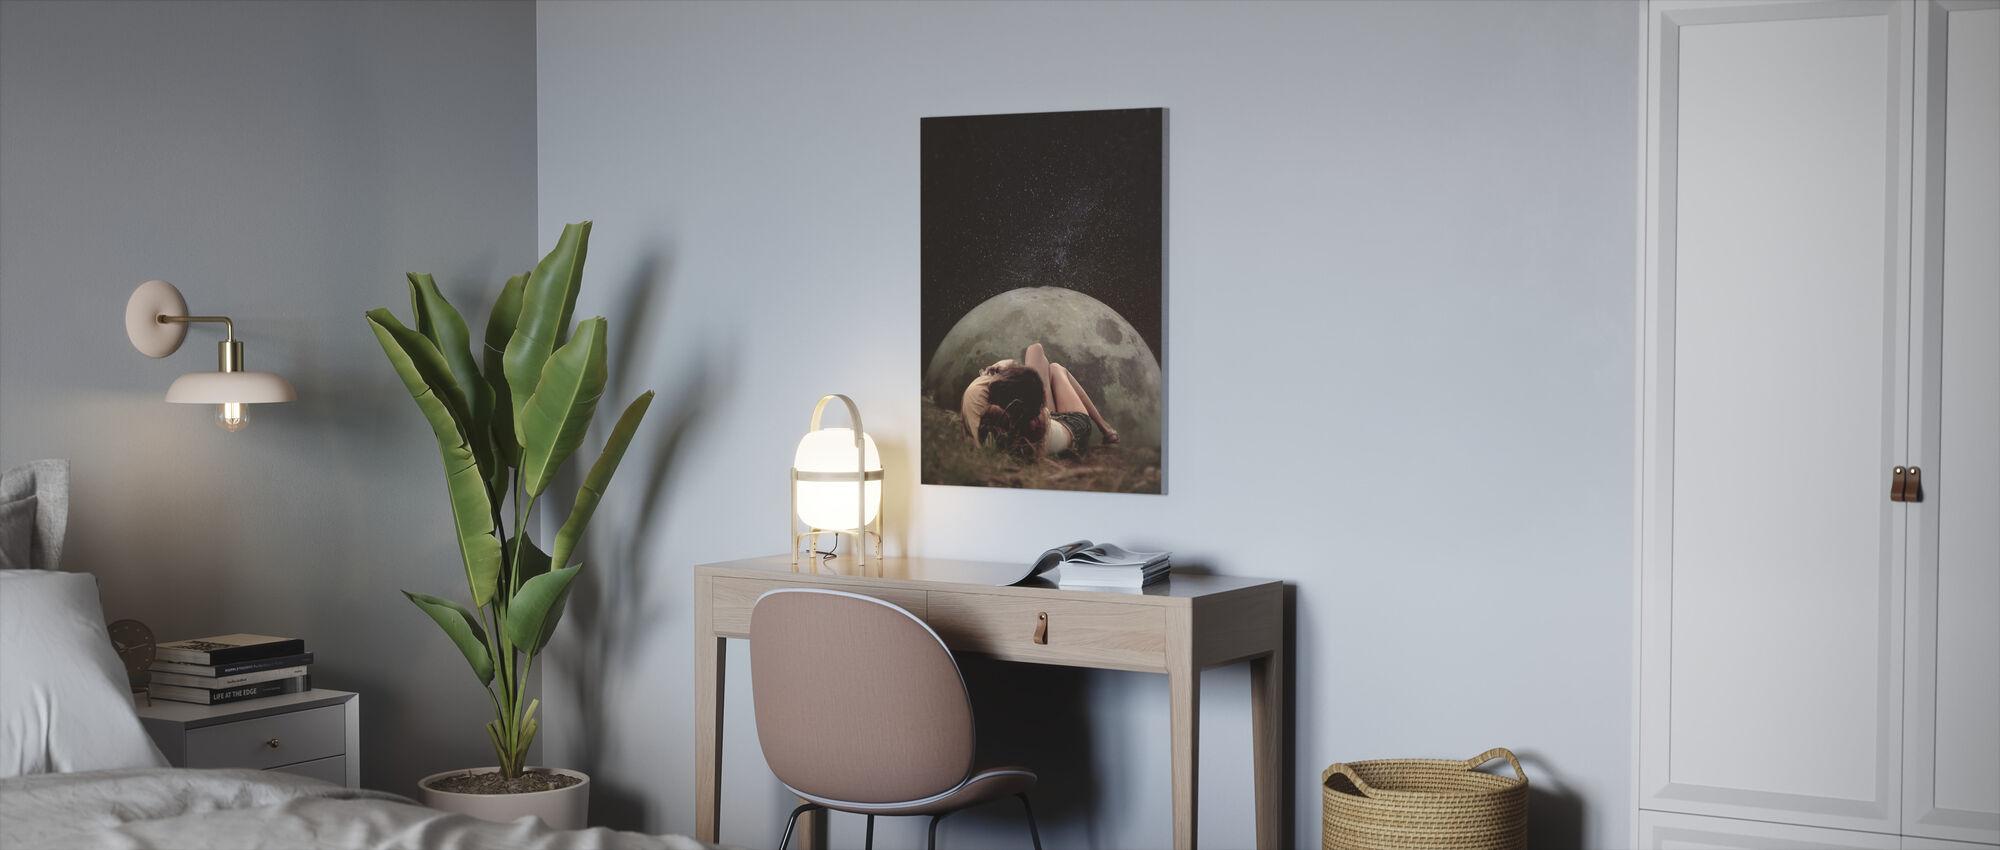 Cosmic Love - Canvas print - Office